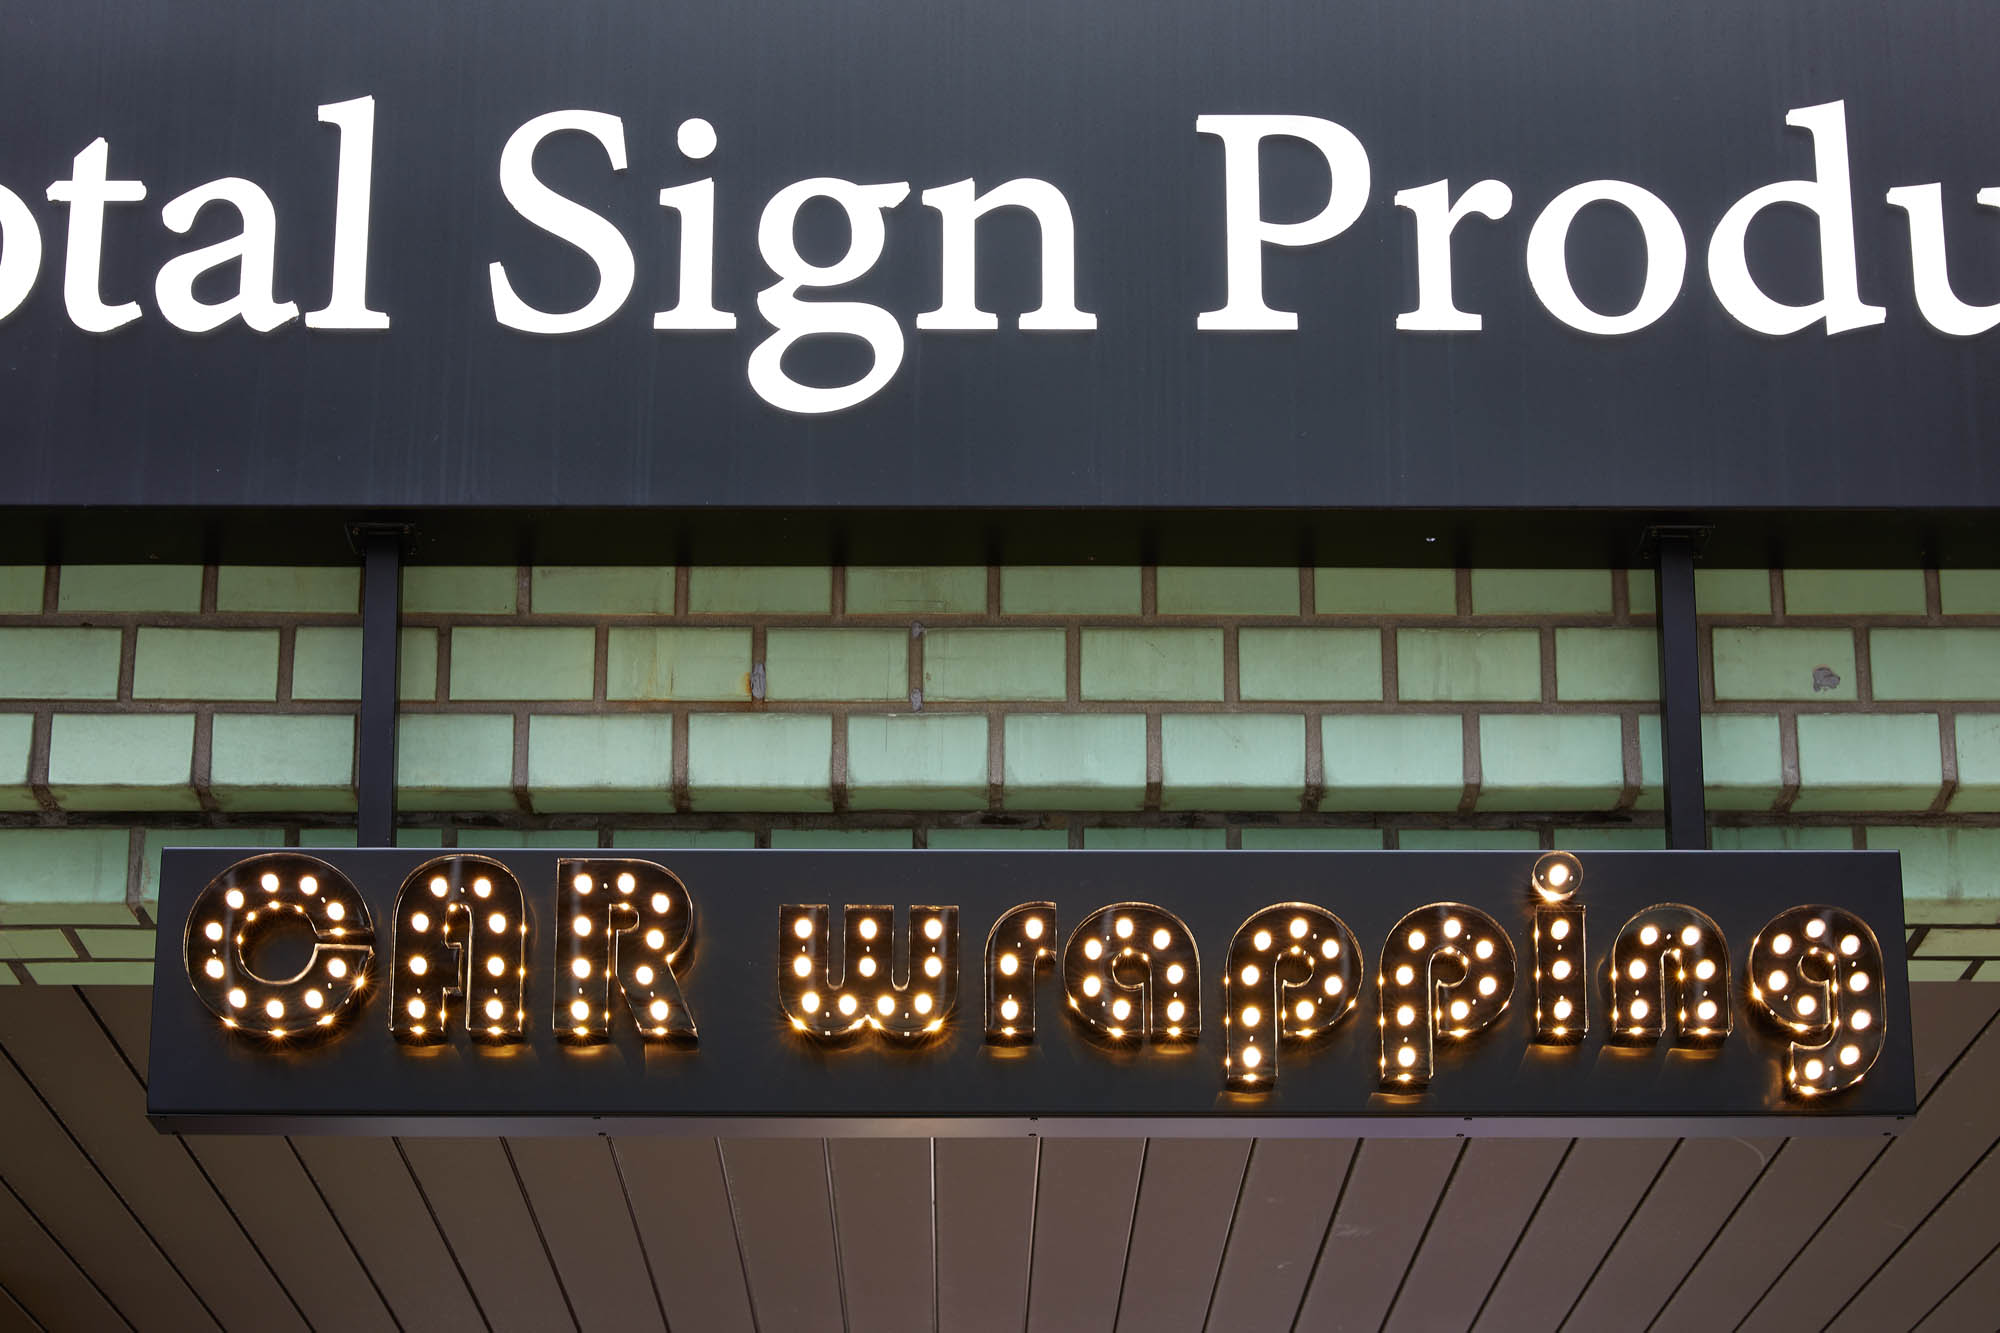 LEDIUS SIGN PRO DIAで表現されたLEDサインの例の写真